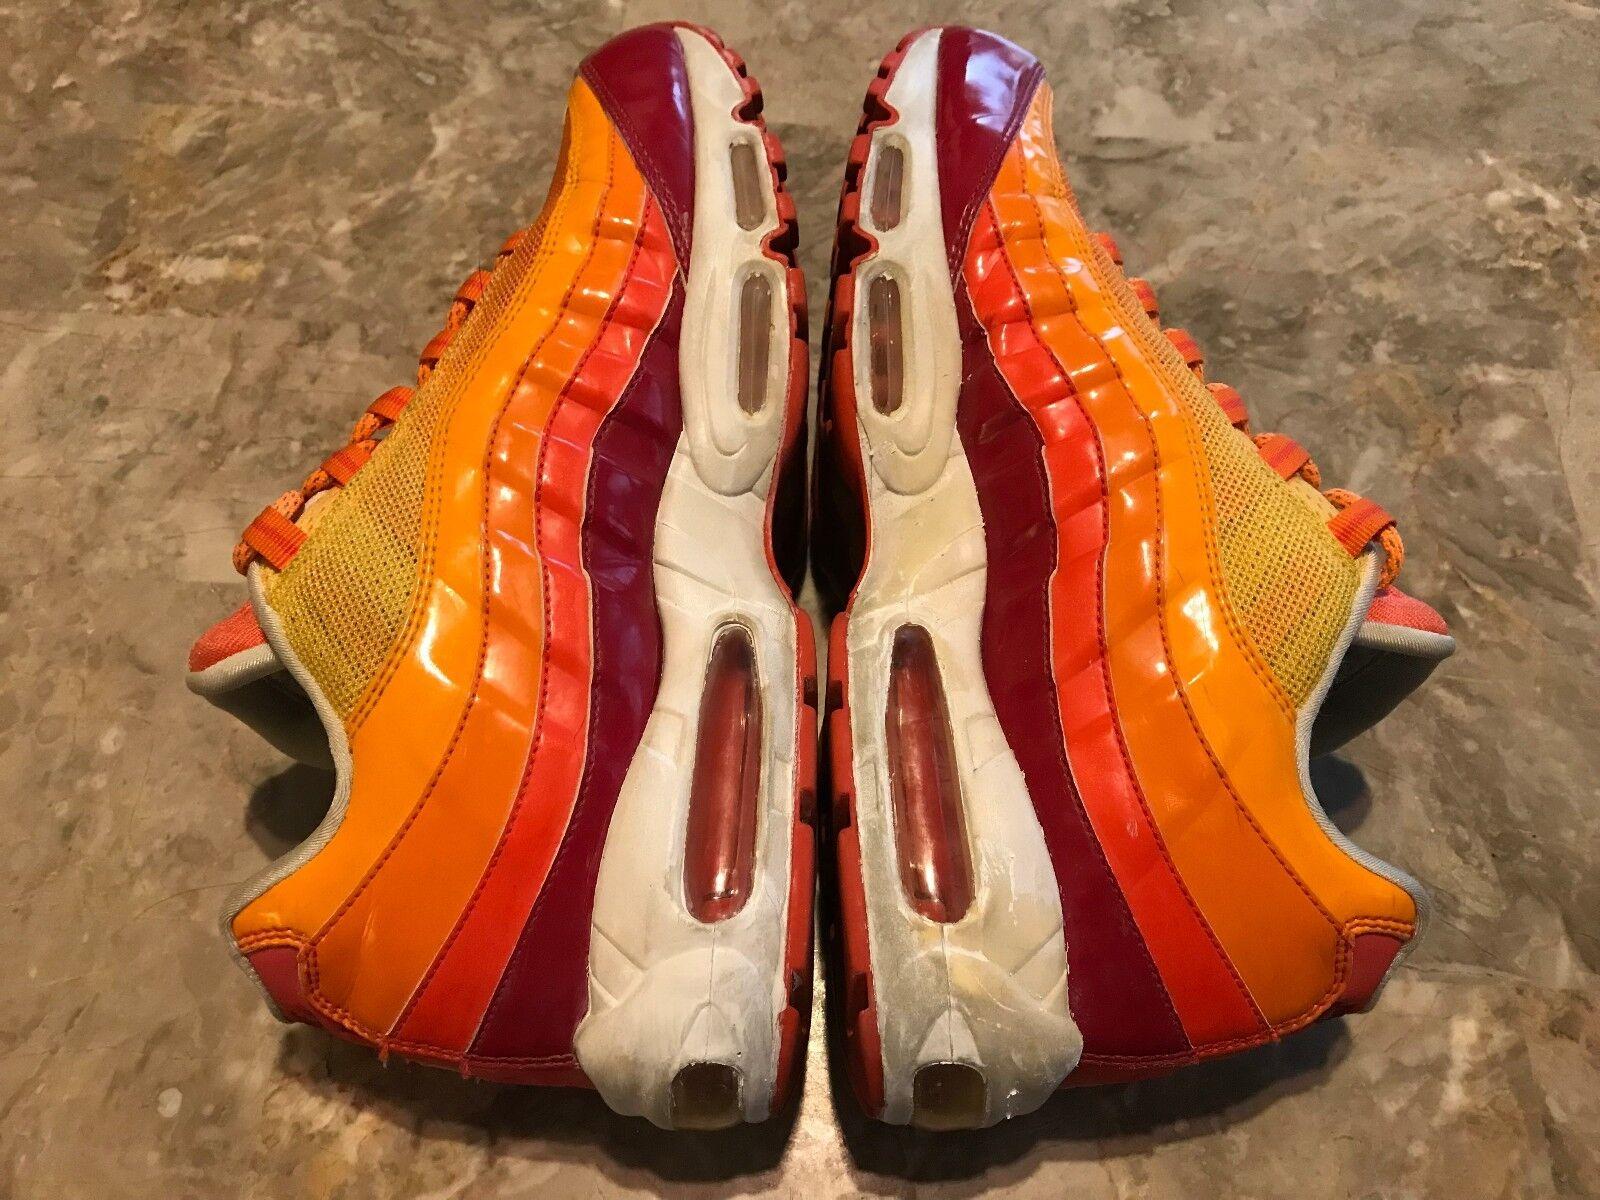 RARE 2018 Nike Air Max 95 Human Torch Fantastic Four Pack Size 12 (609048-681)